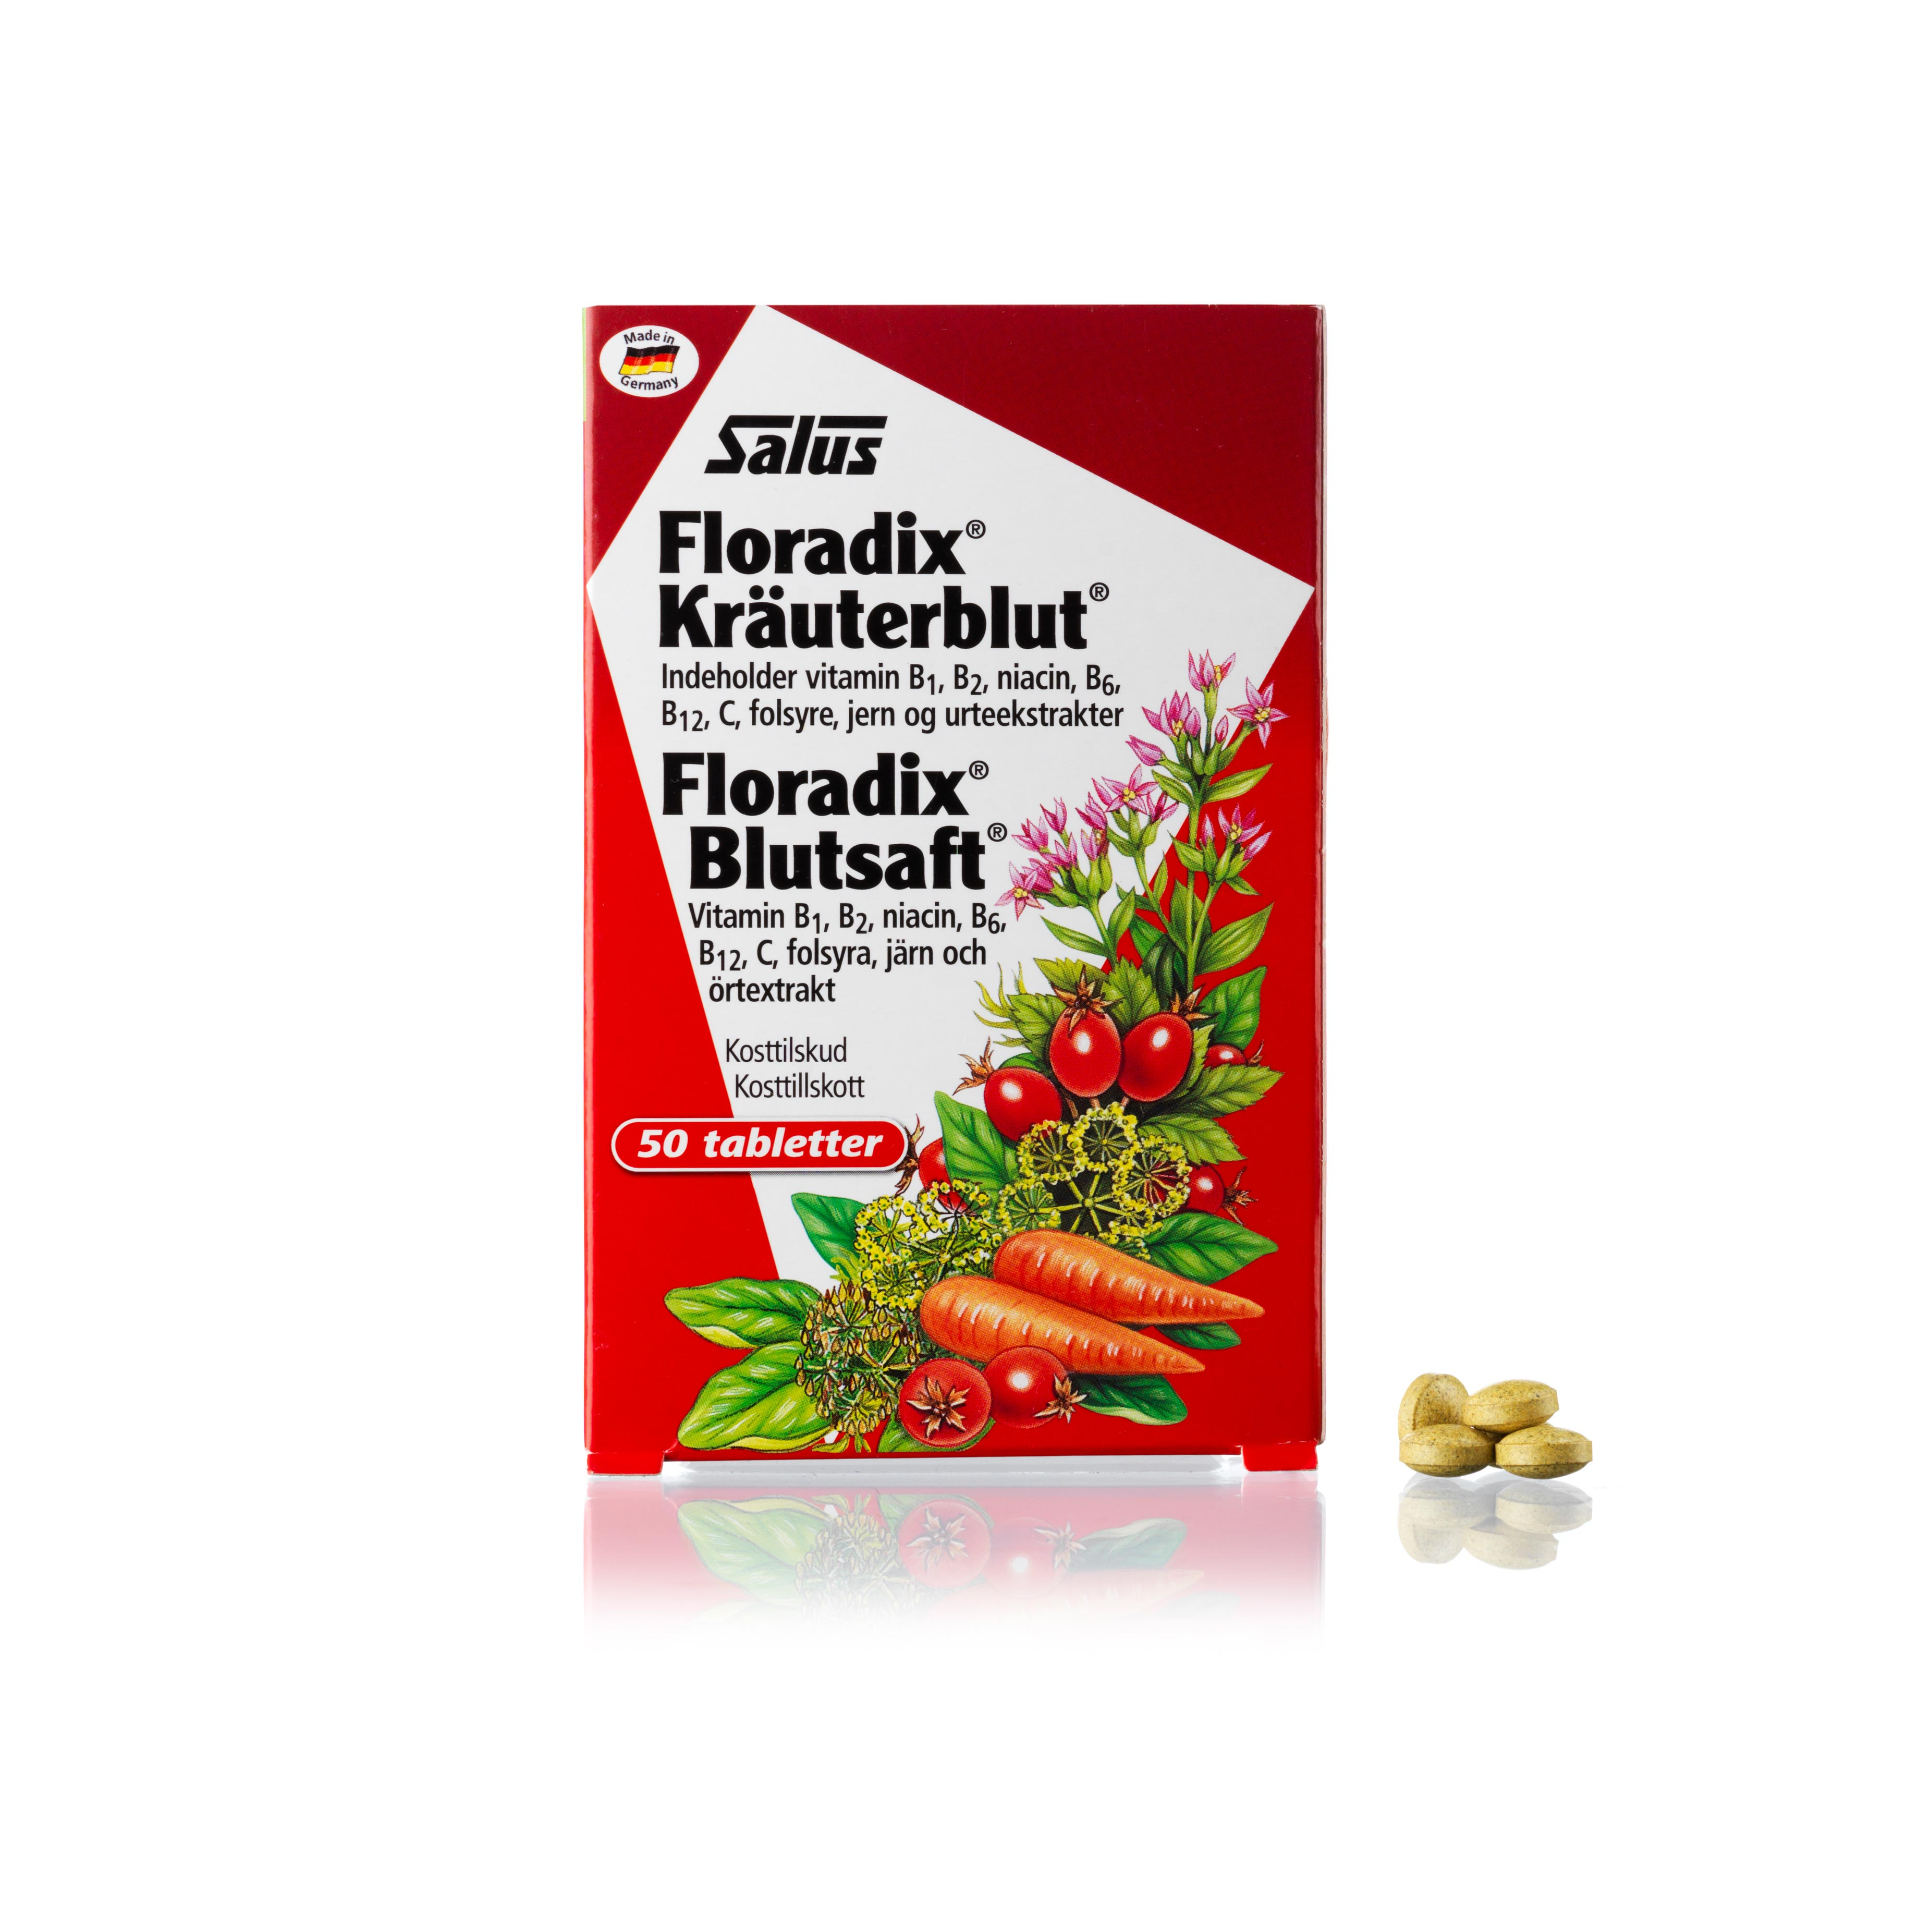 Billede af Salus Floradix Kräuterblut - 50 stk.